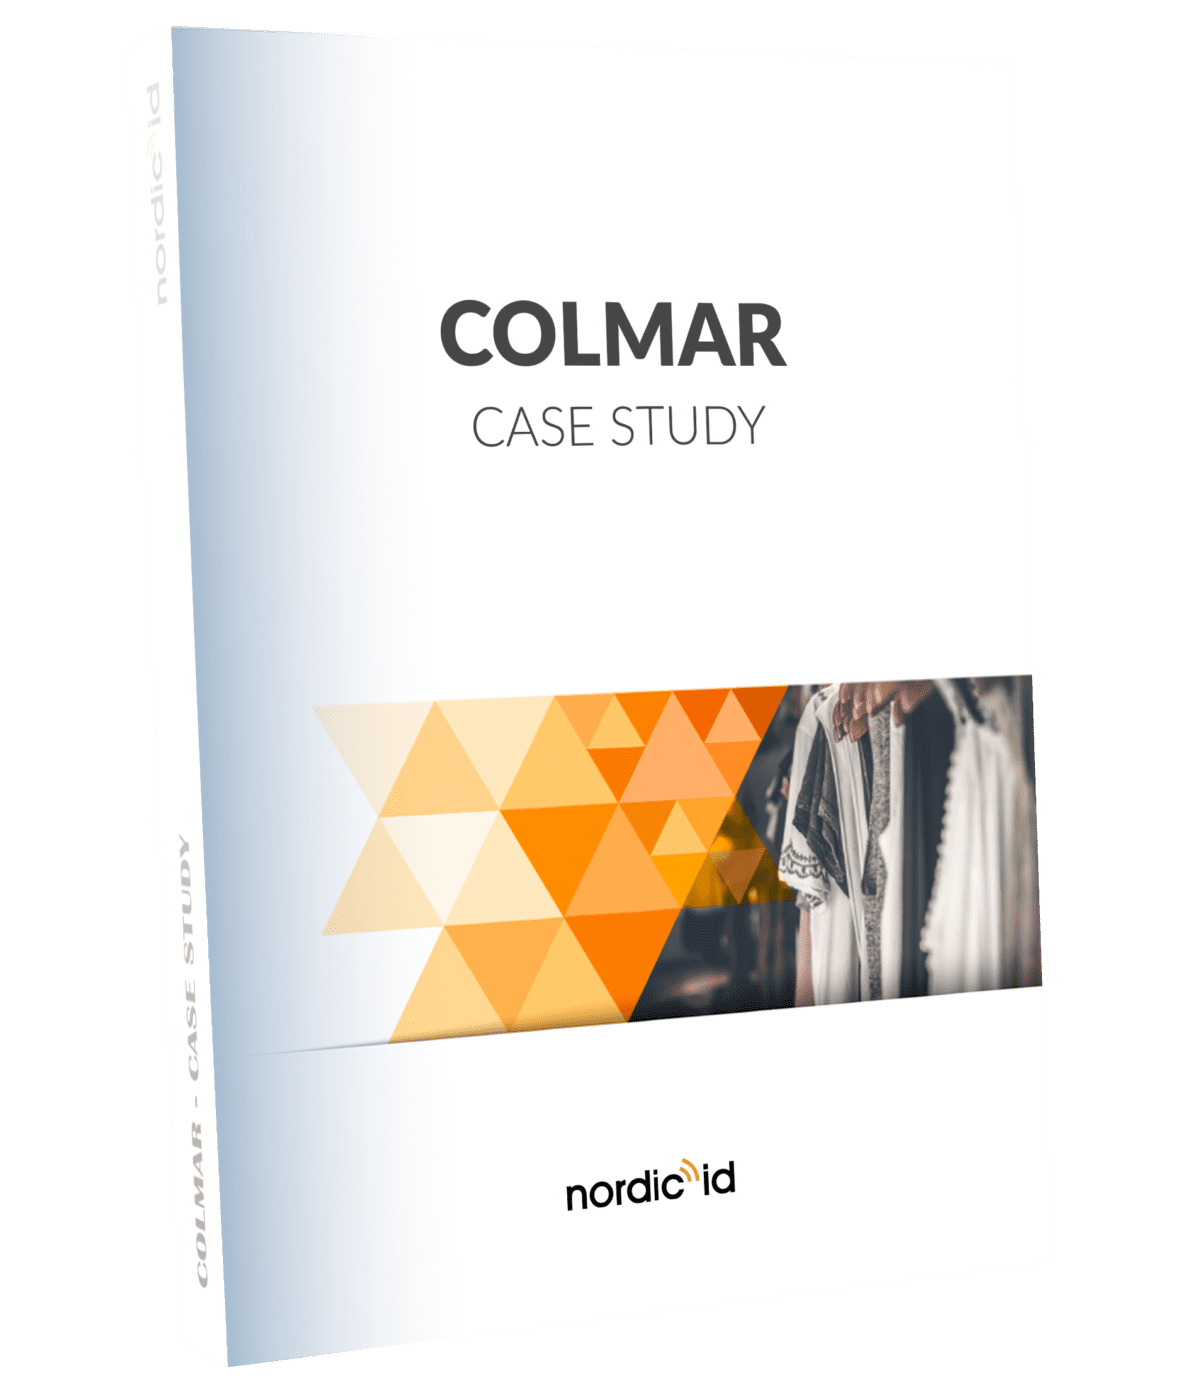 colmar case study mockup